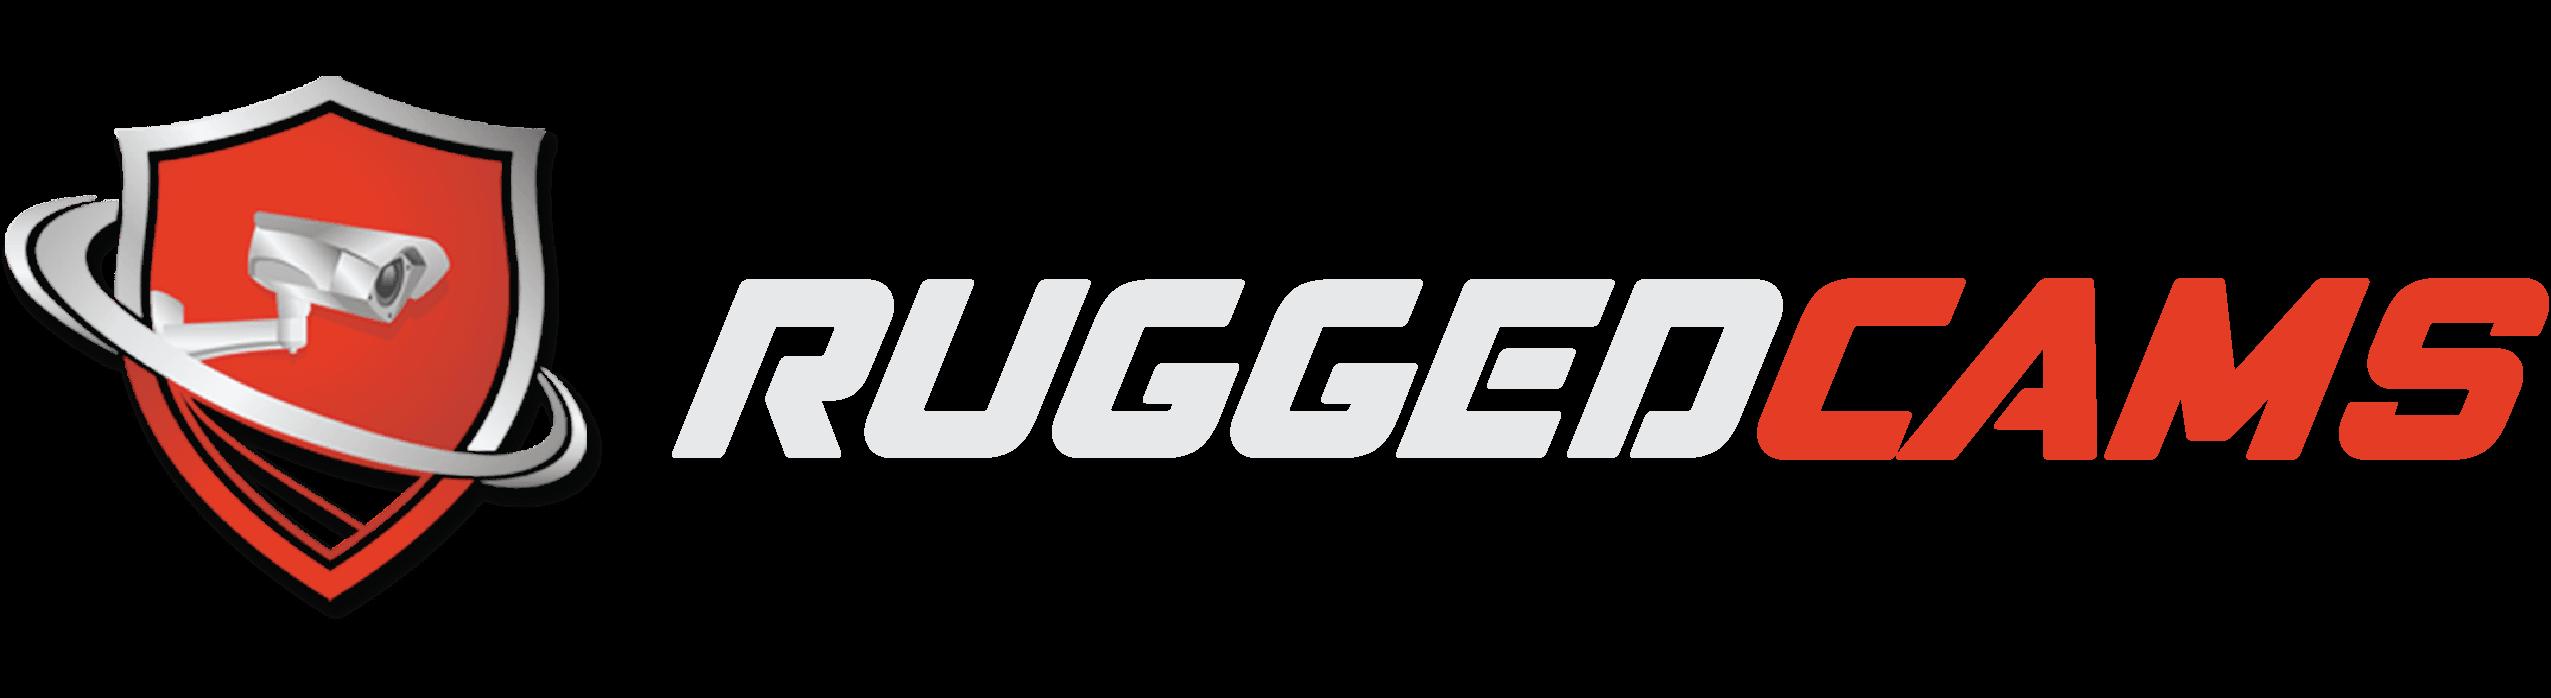 Rugged Cams